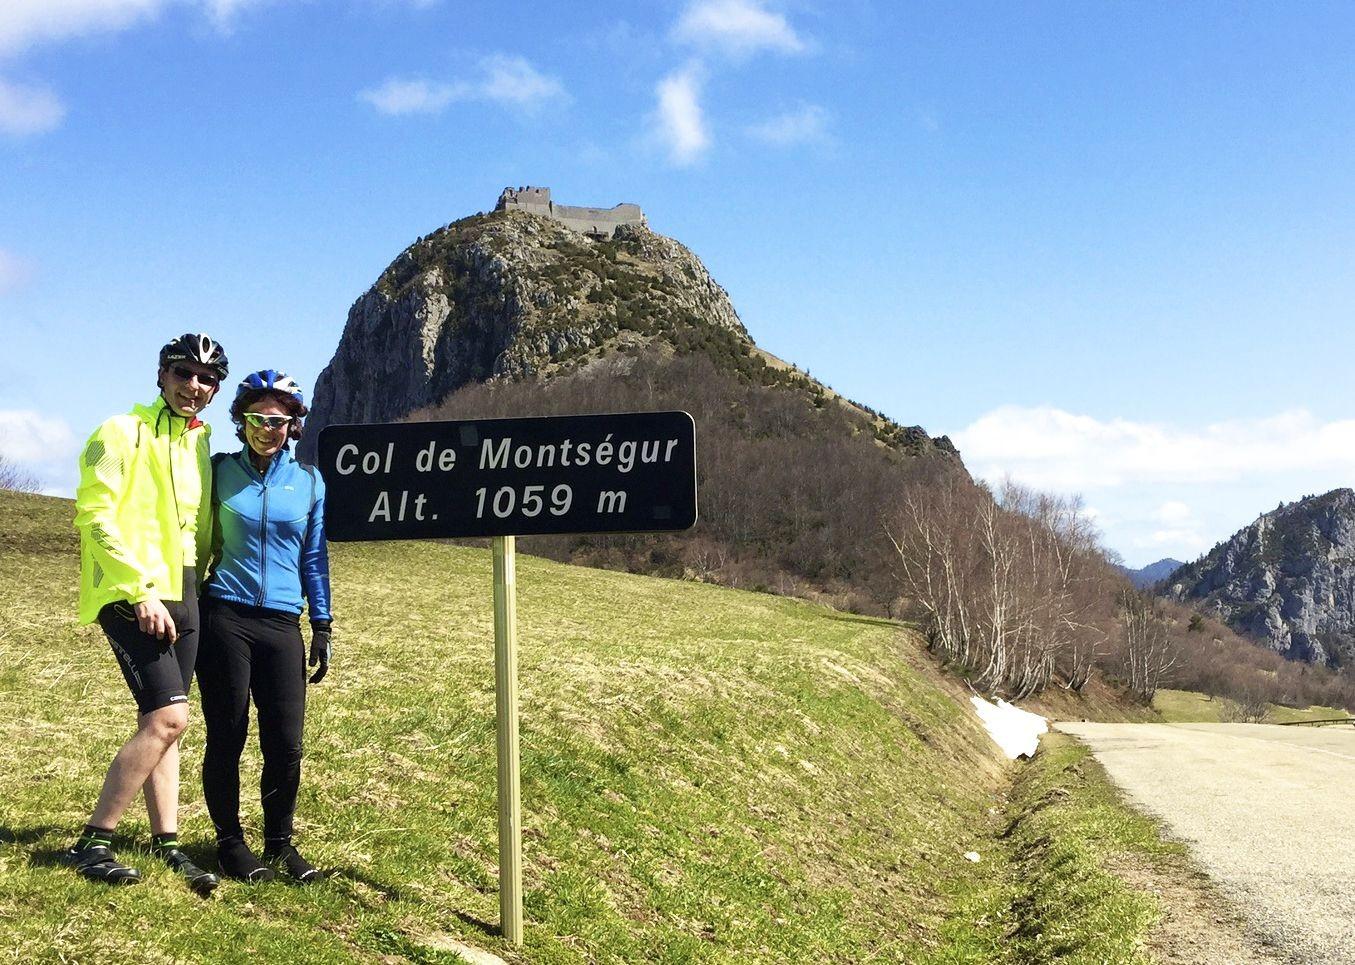 road-cycling-holiday-france.jpg - France - Pyrenees Fitness Week (Grade 2-3) - Road Cycling